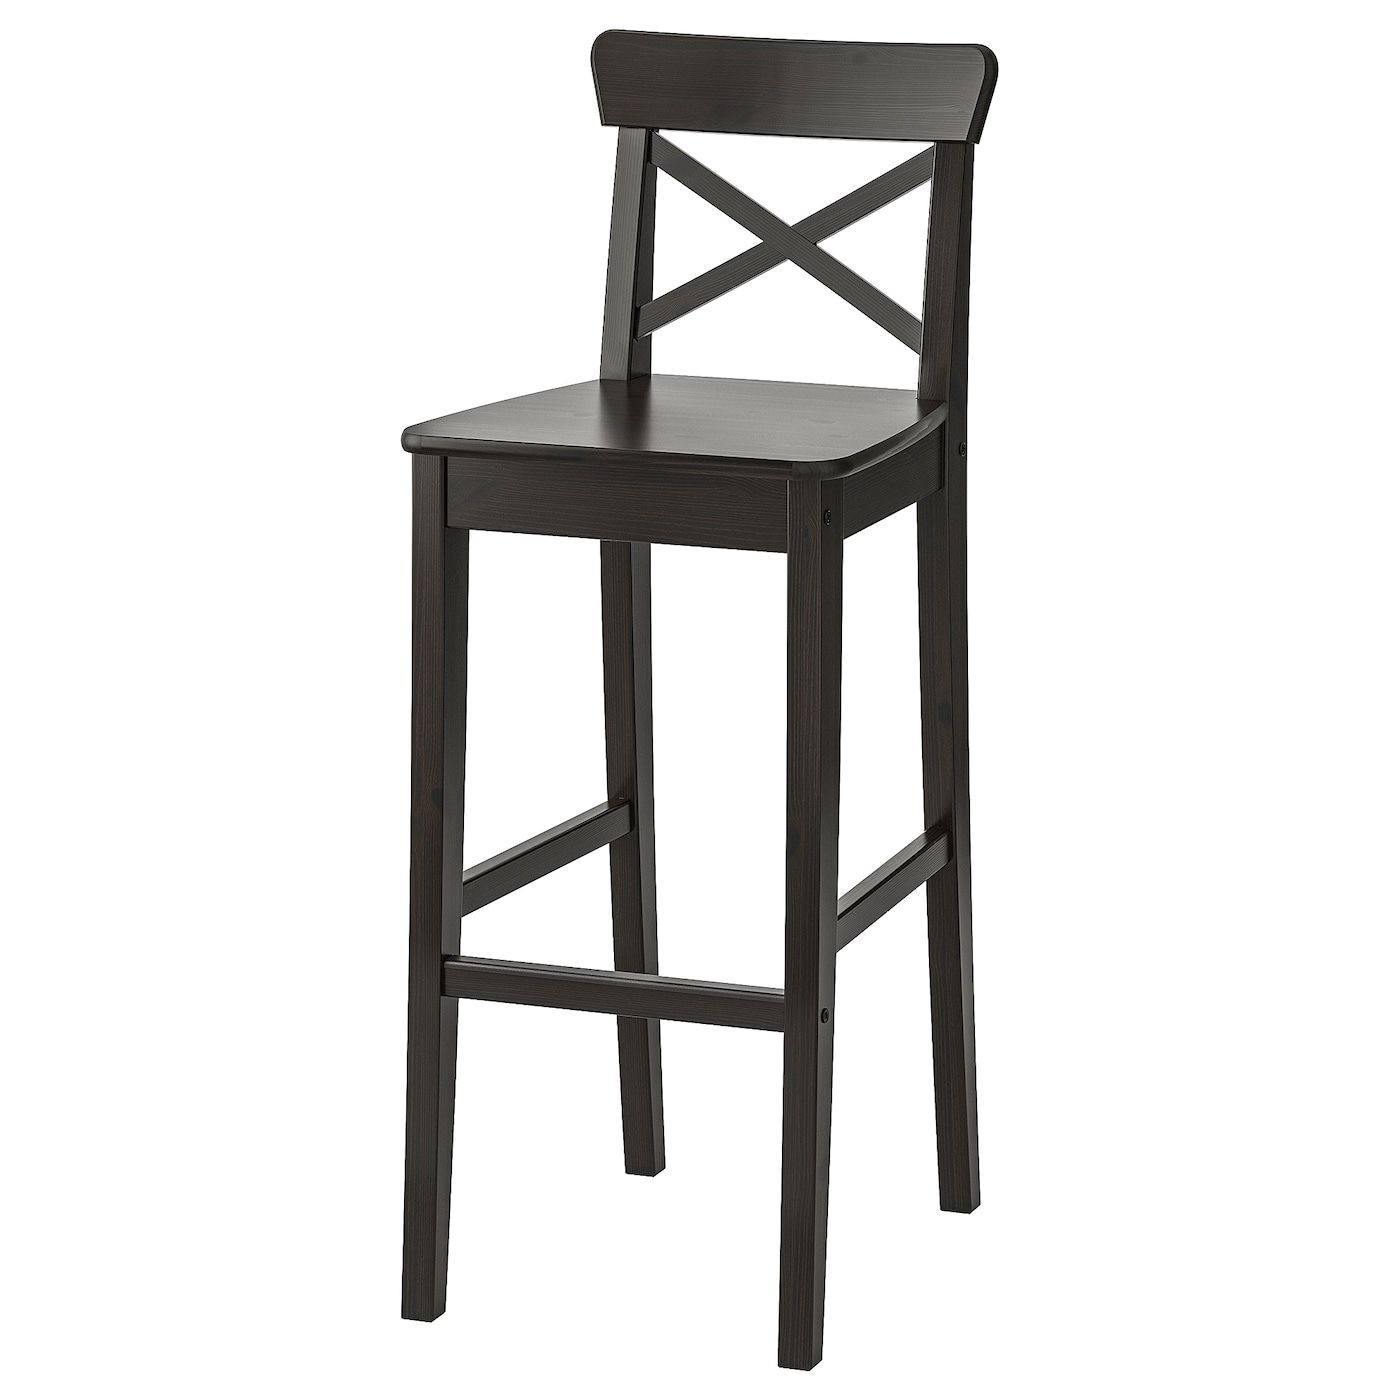 Ikea Ingolf Bar Stool With Backrest Wooden Bar Stools Bar